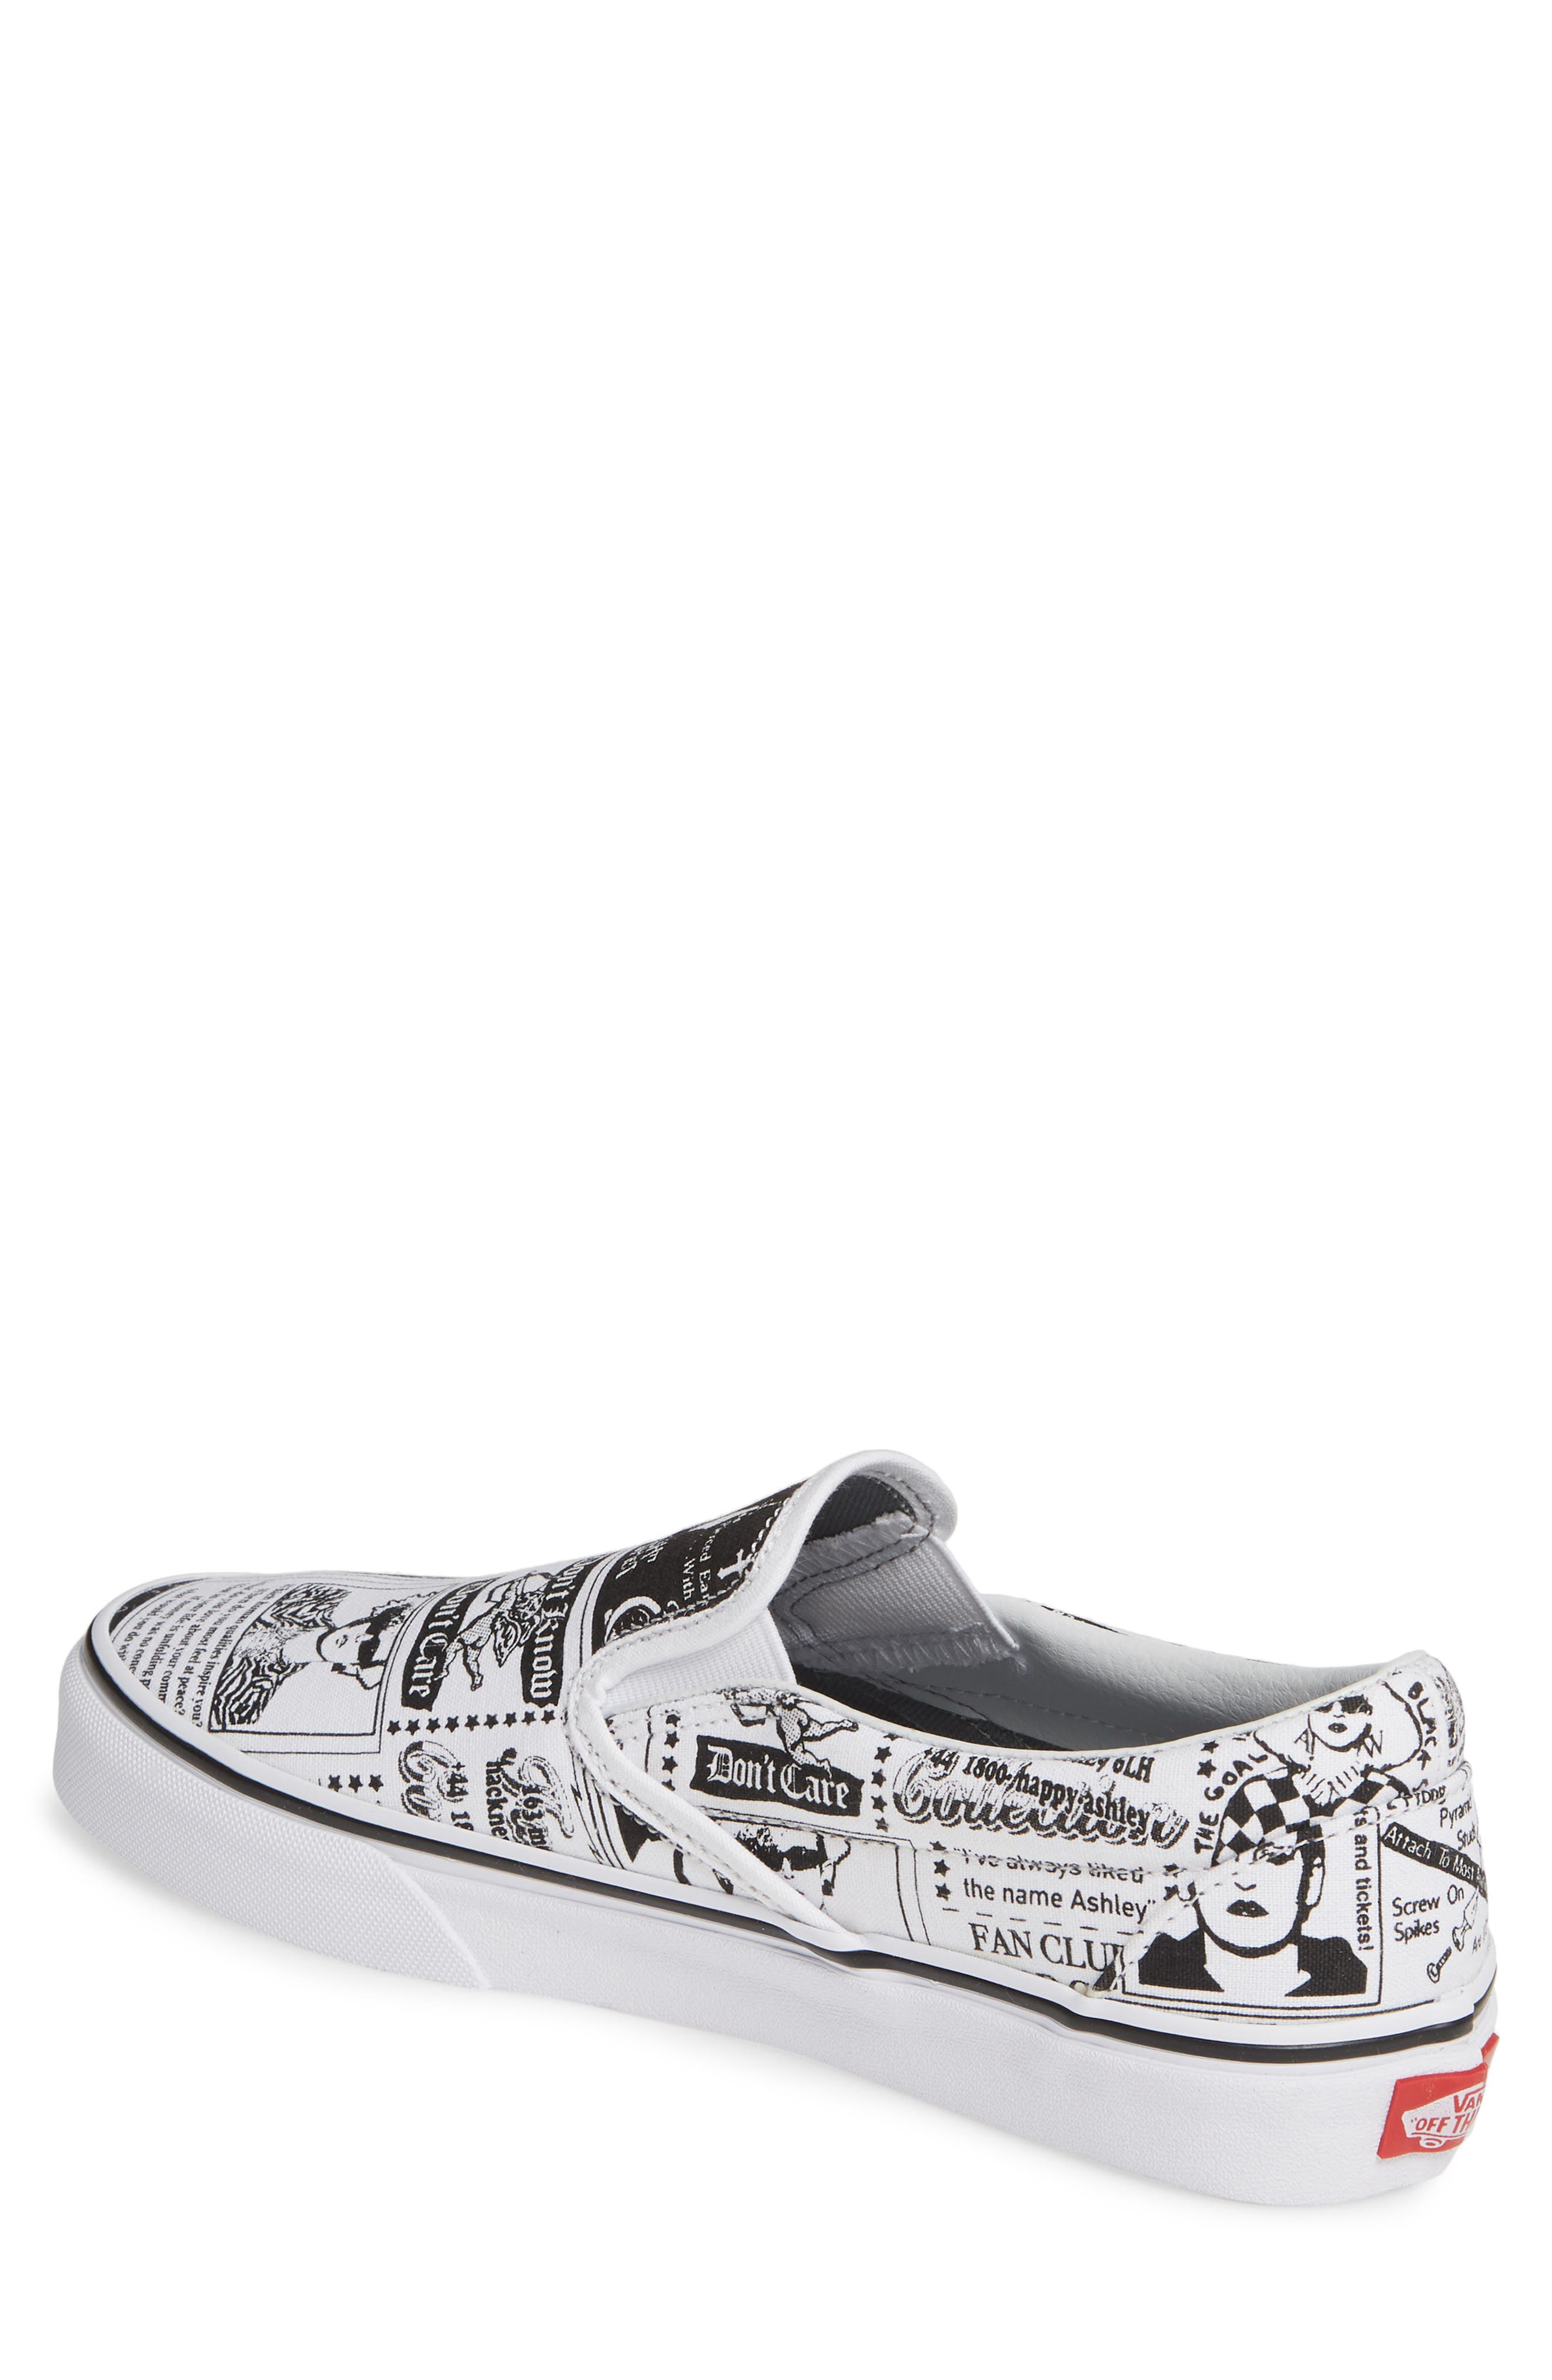 VANS,                             x Ashley Williams Print Classic Slip-On Sneaker,                             Alternate thumbnail 2, color,                             100